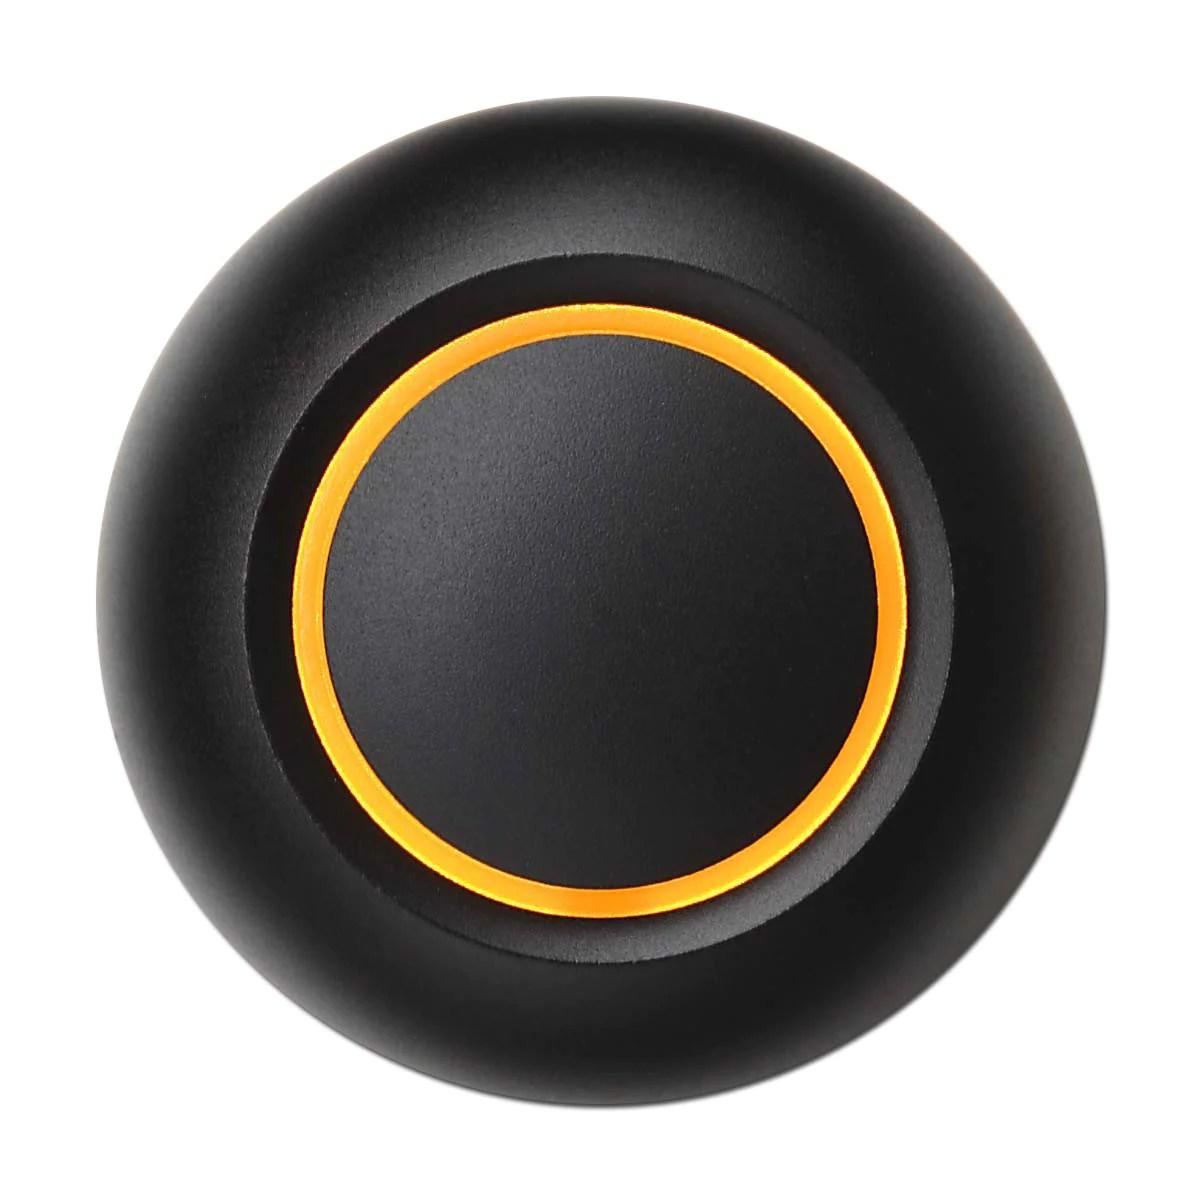 True Black Doorbell Button Spore